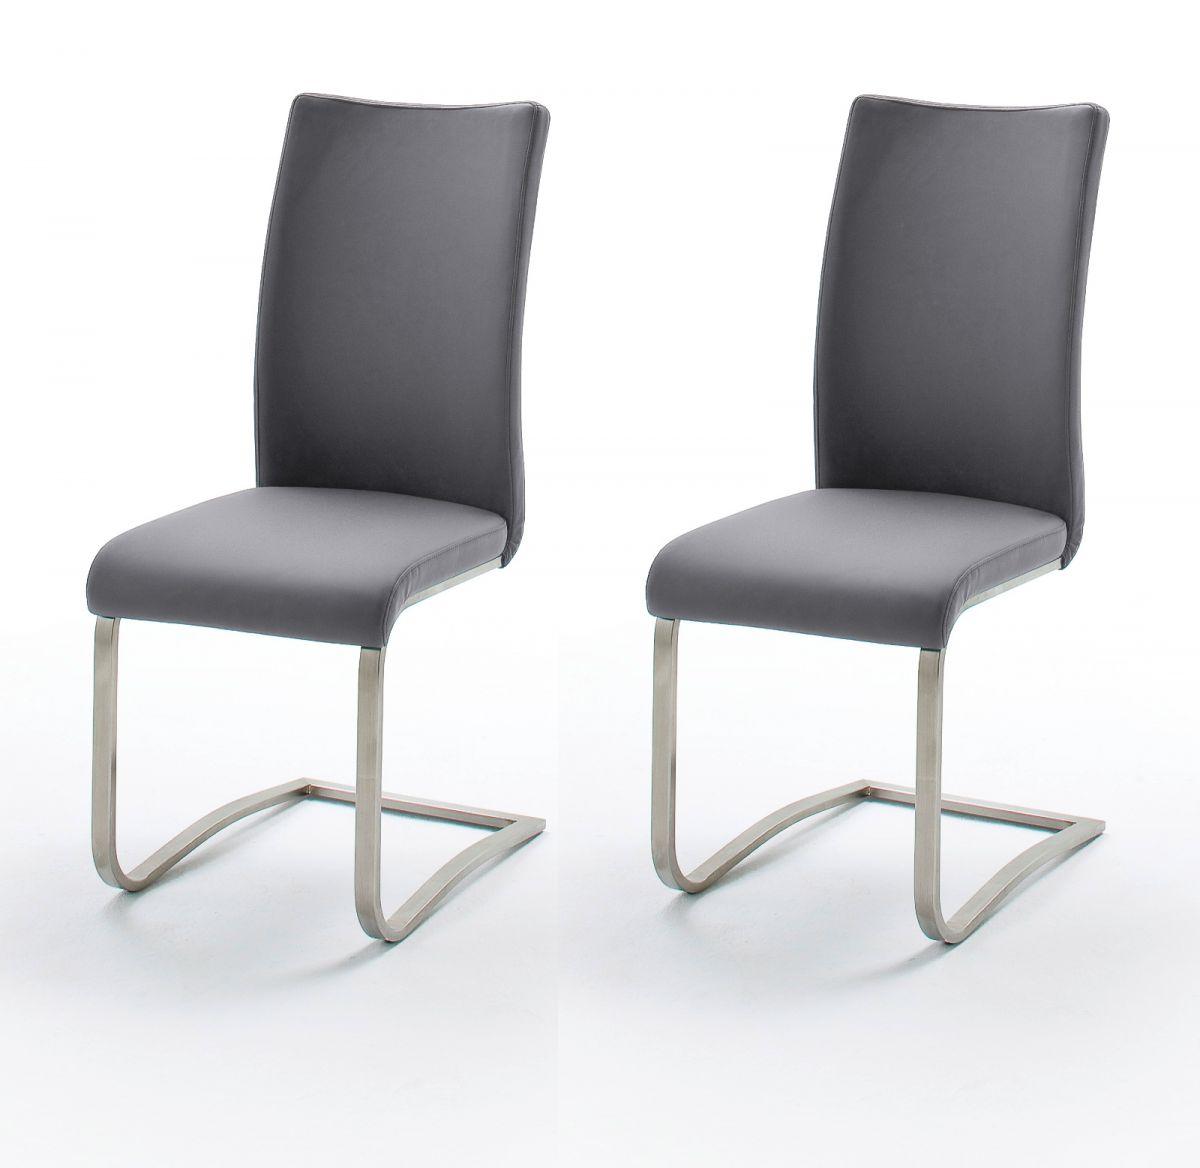 2 x Stuhl Arco Grau Freischwinger Leder